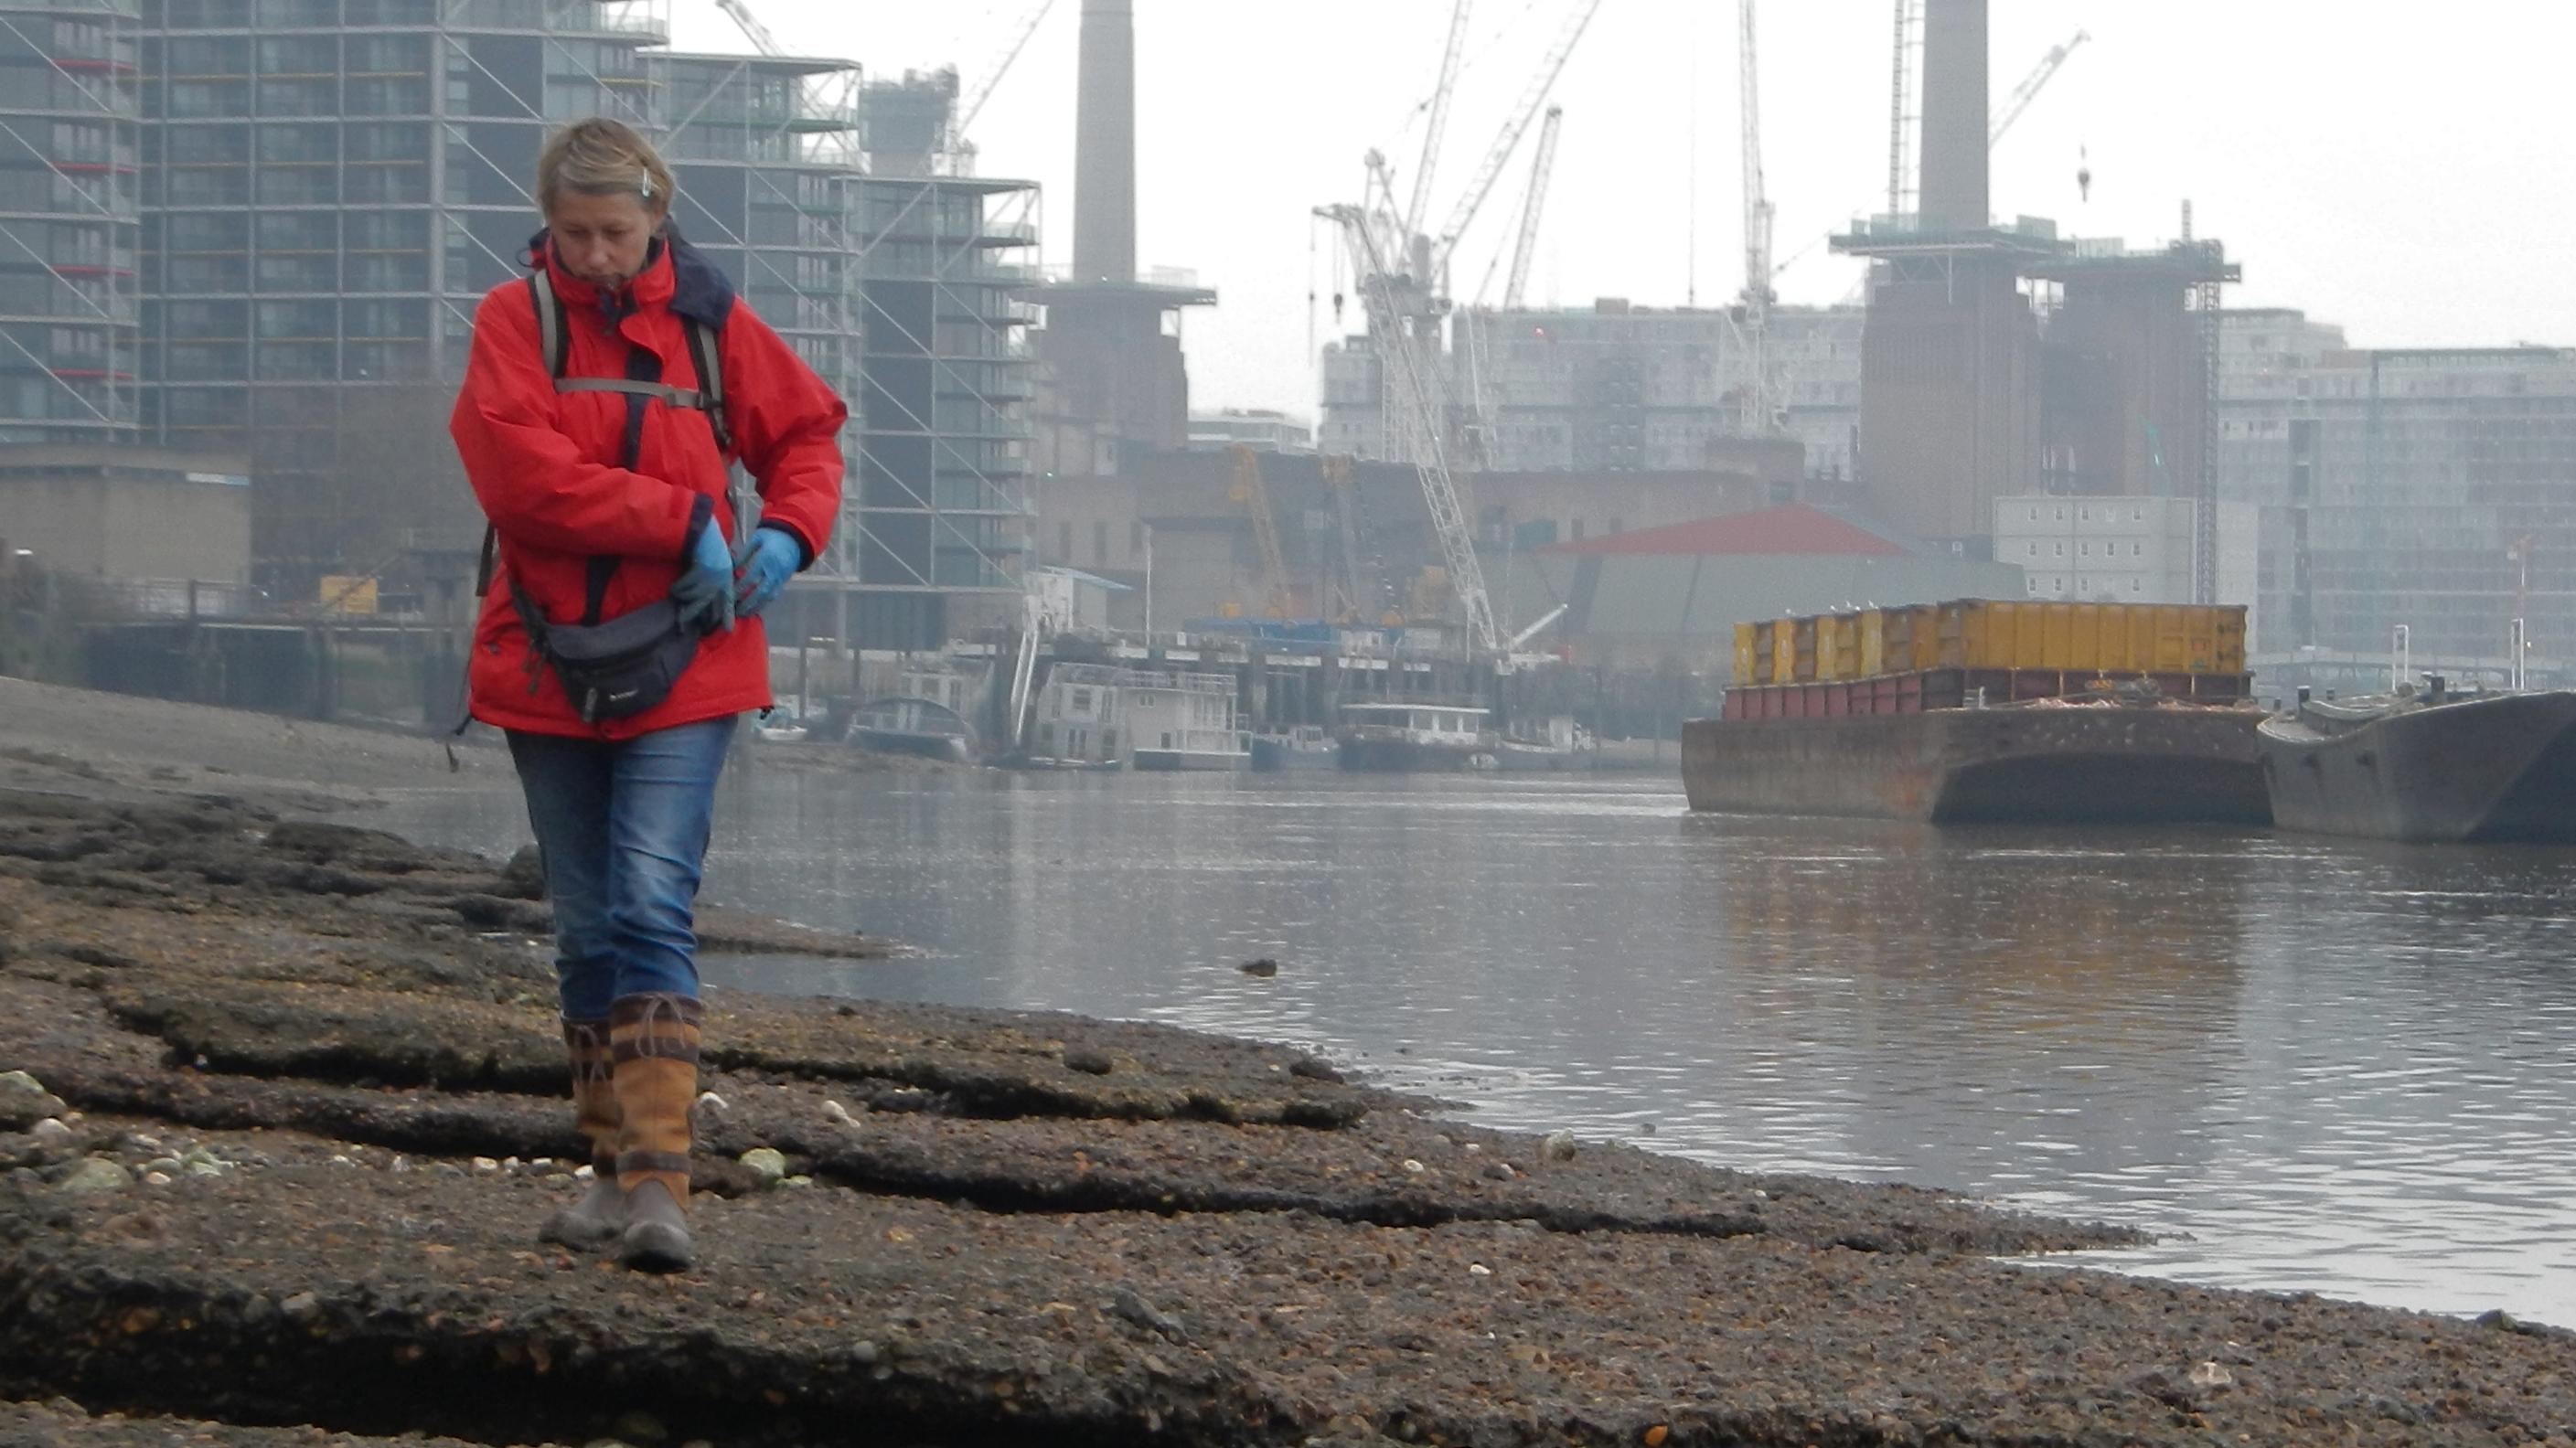 London's 'Mudlark' Pulls Treasure From The Thames